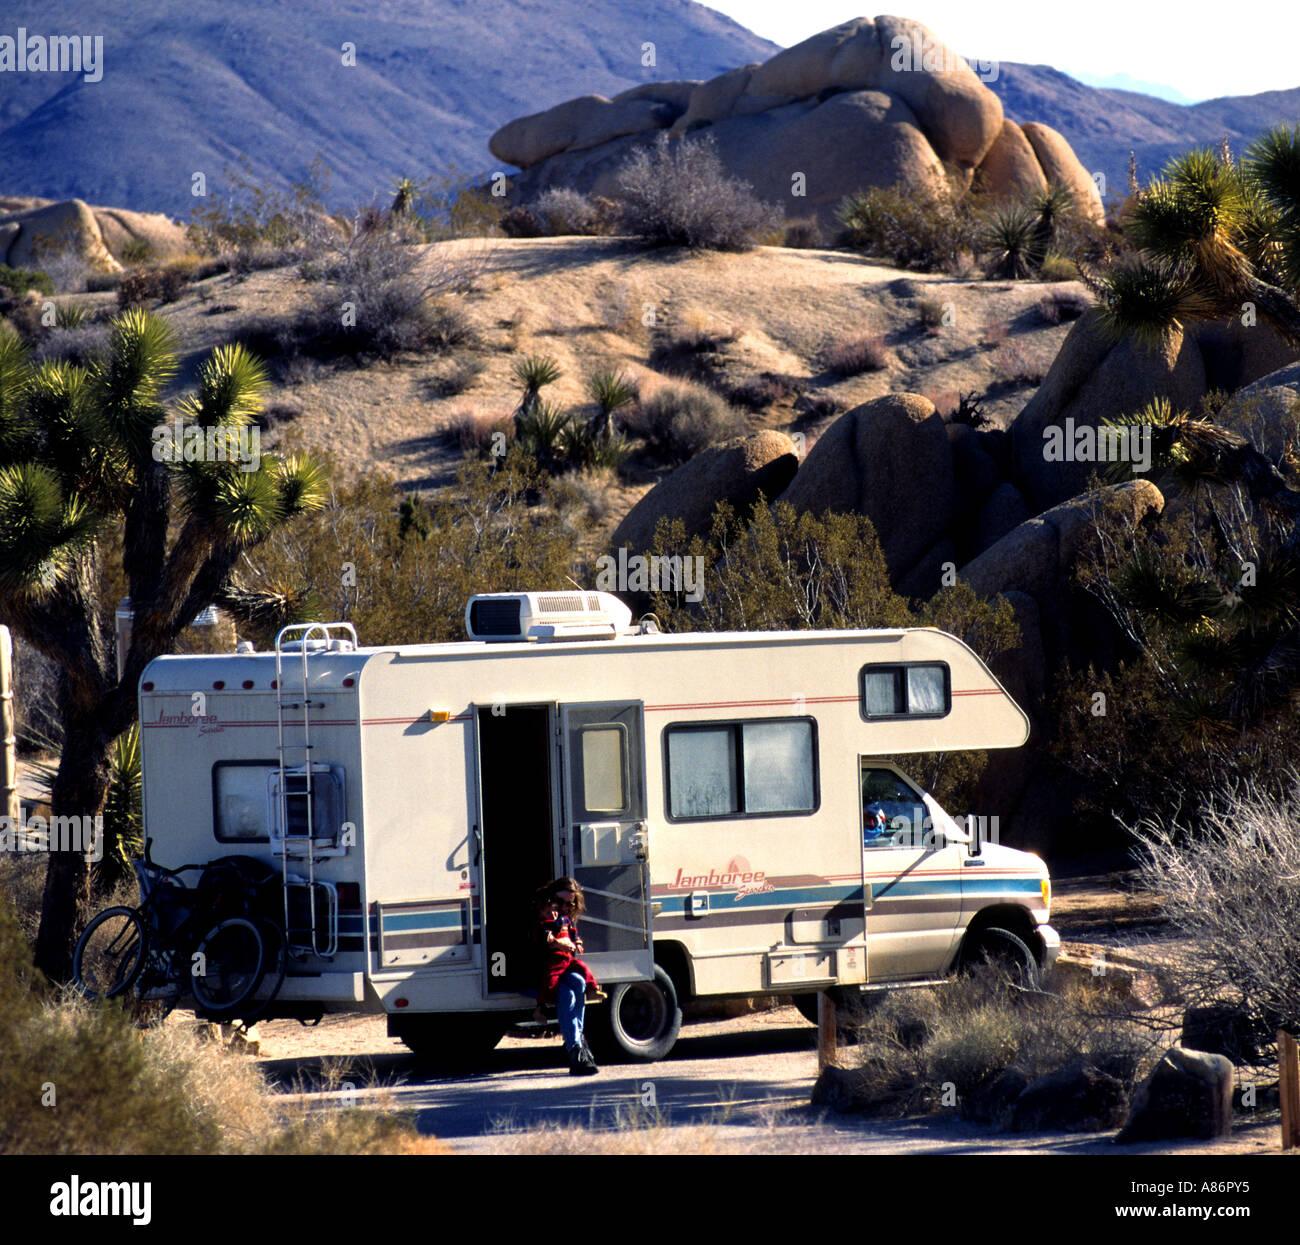 Camping Camper Usa Joshua Tree National Park Stock Photo